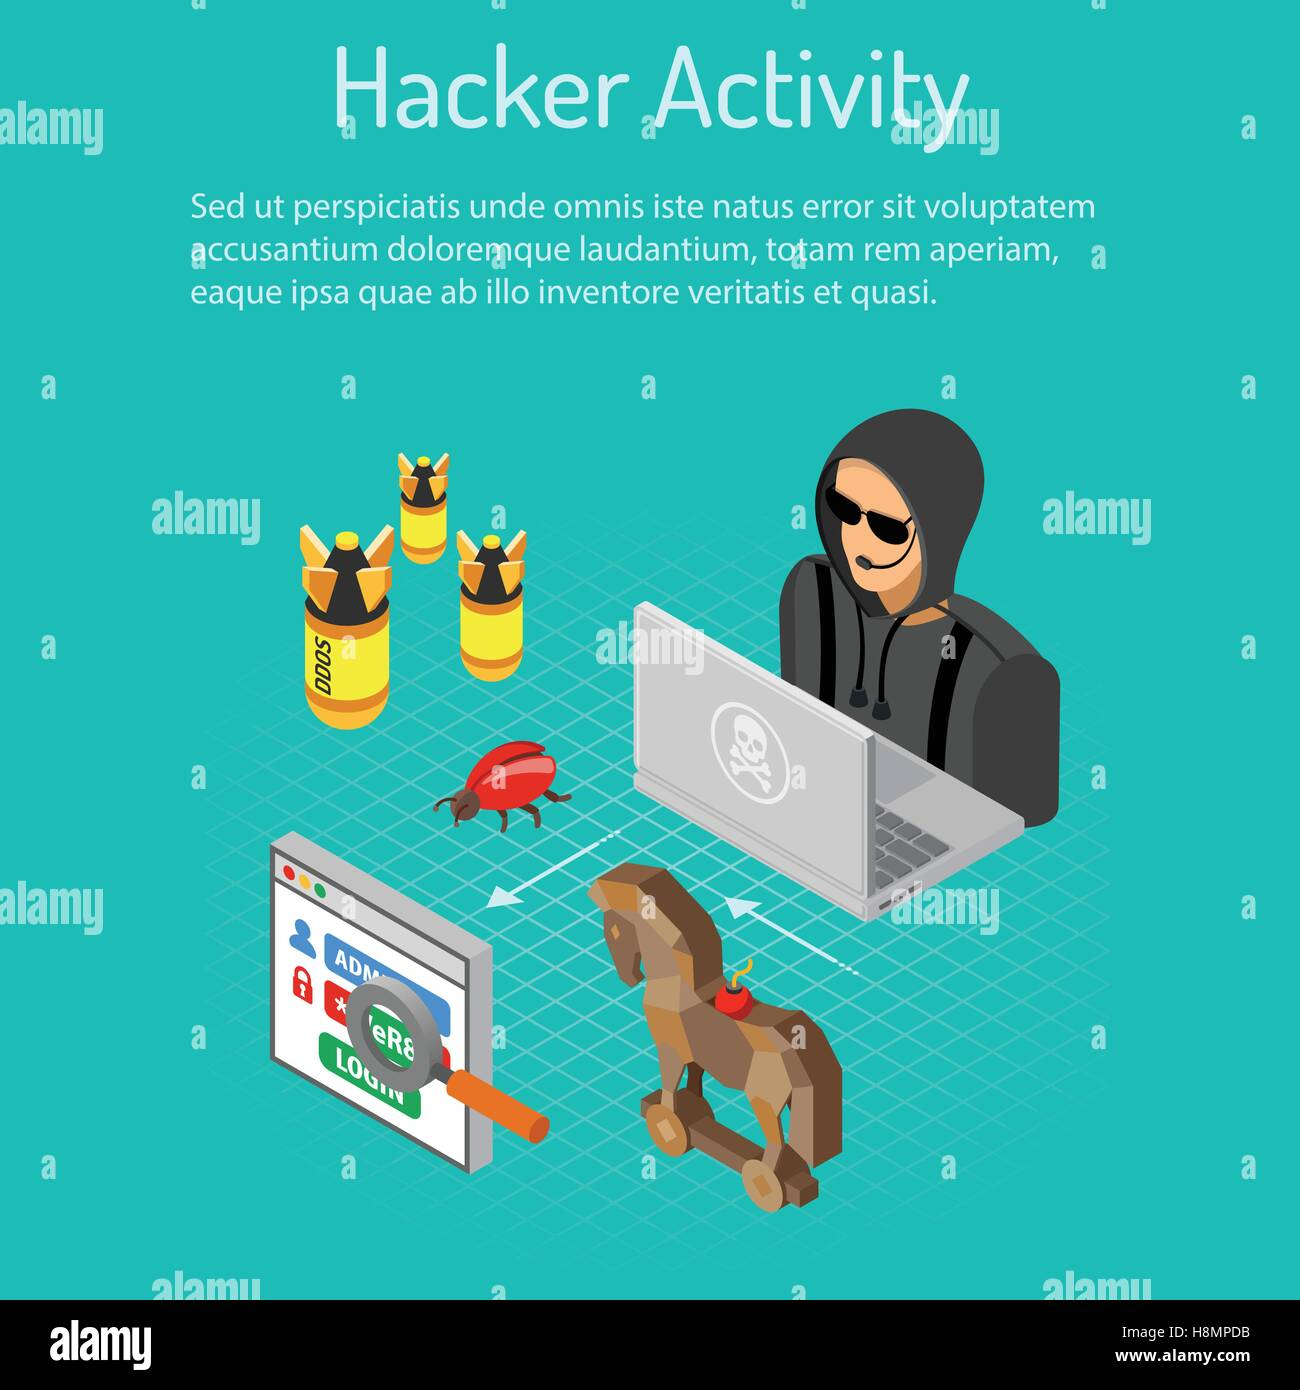 Hacker-Aktivität-Konzept Stockbild